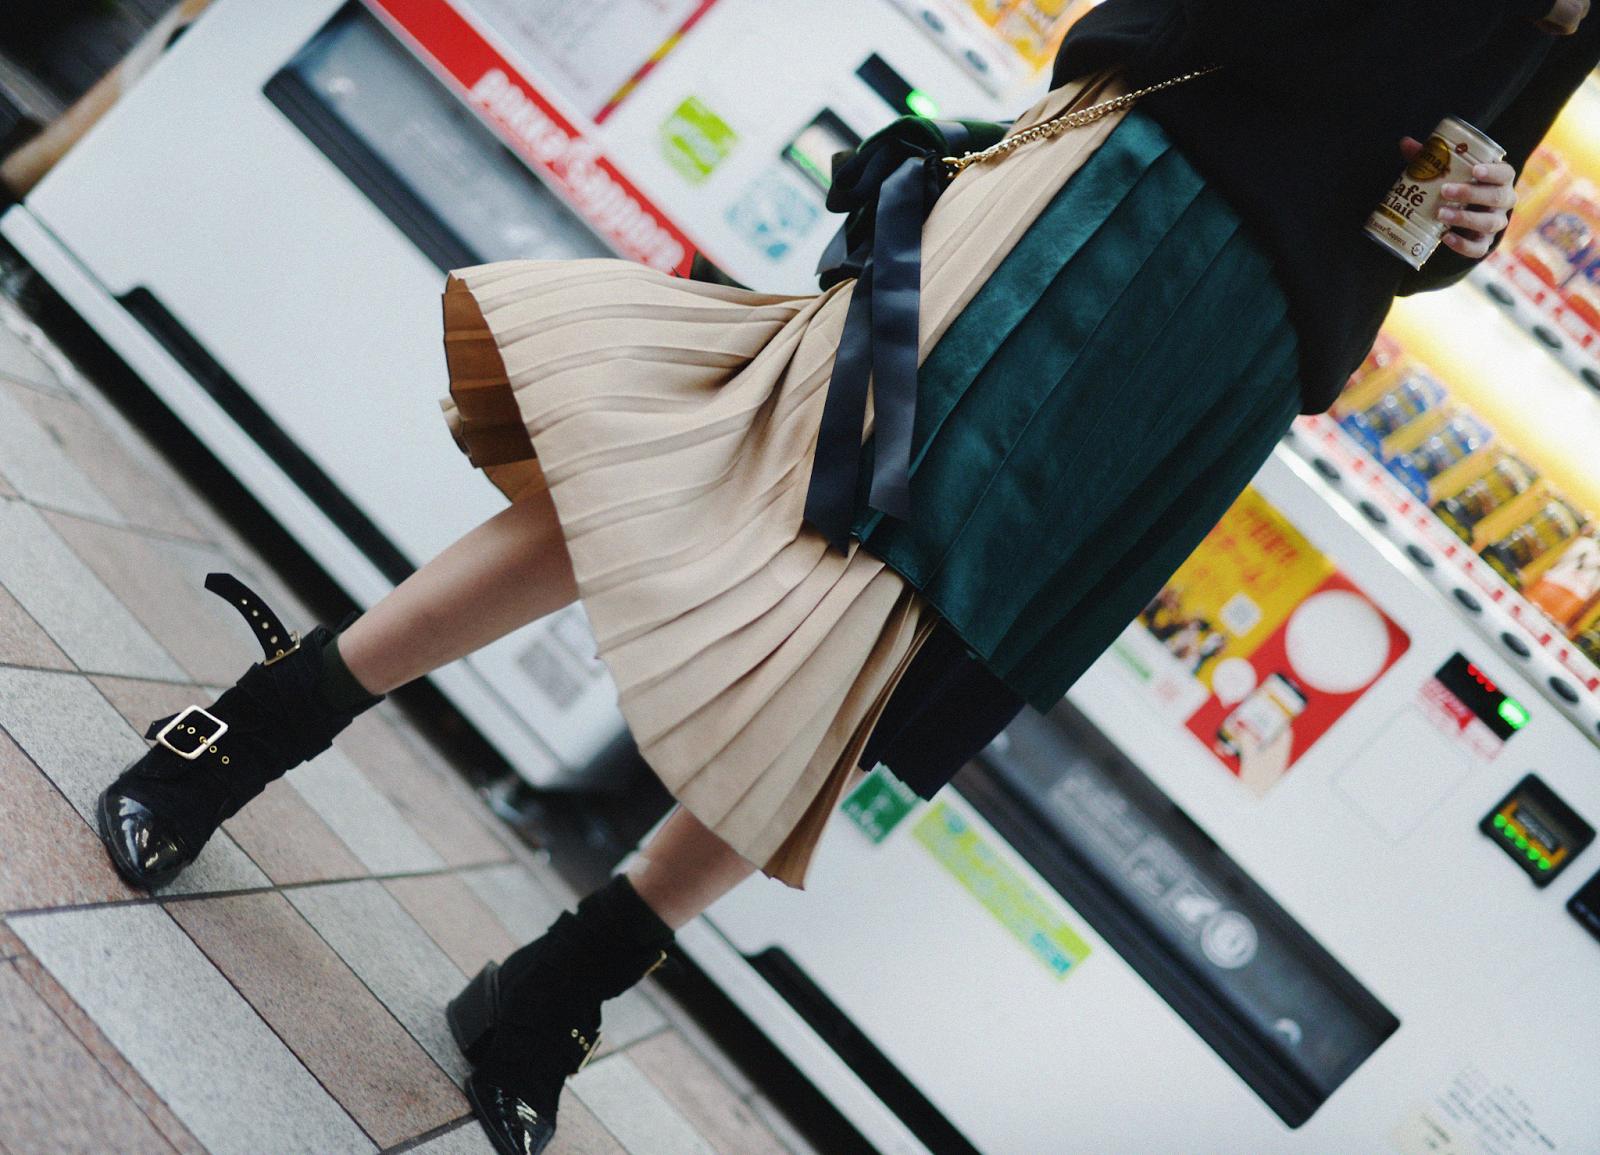 Asymmetric Pleated Skirt ASTRAET Sacai Uniqlo Tokyo Japan / FOREVERVANNY.com